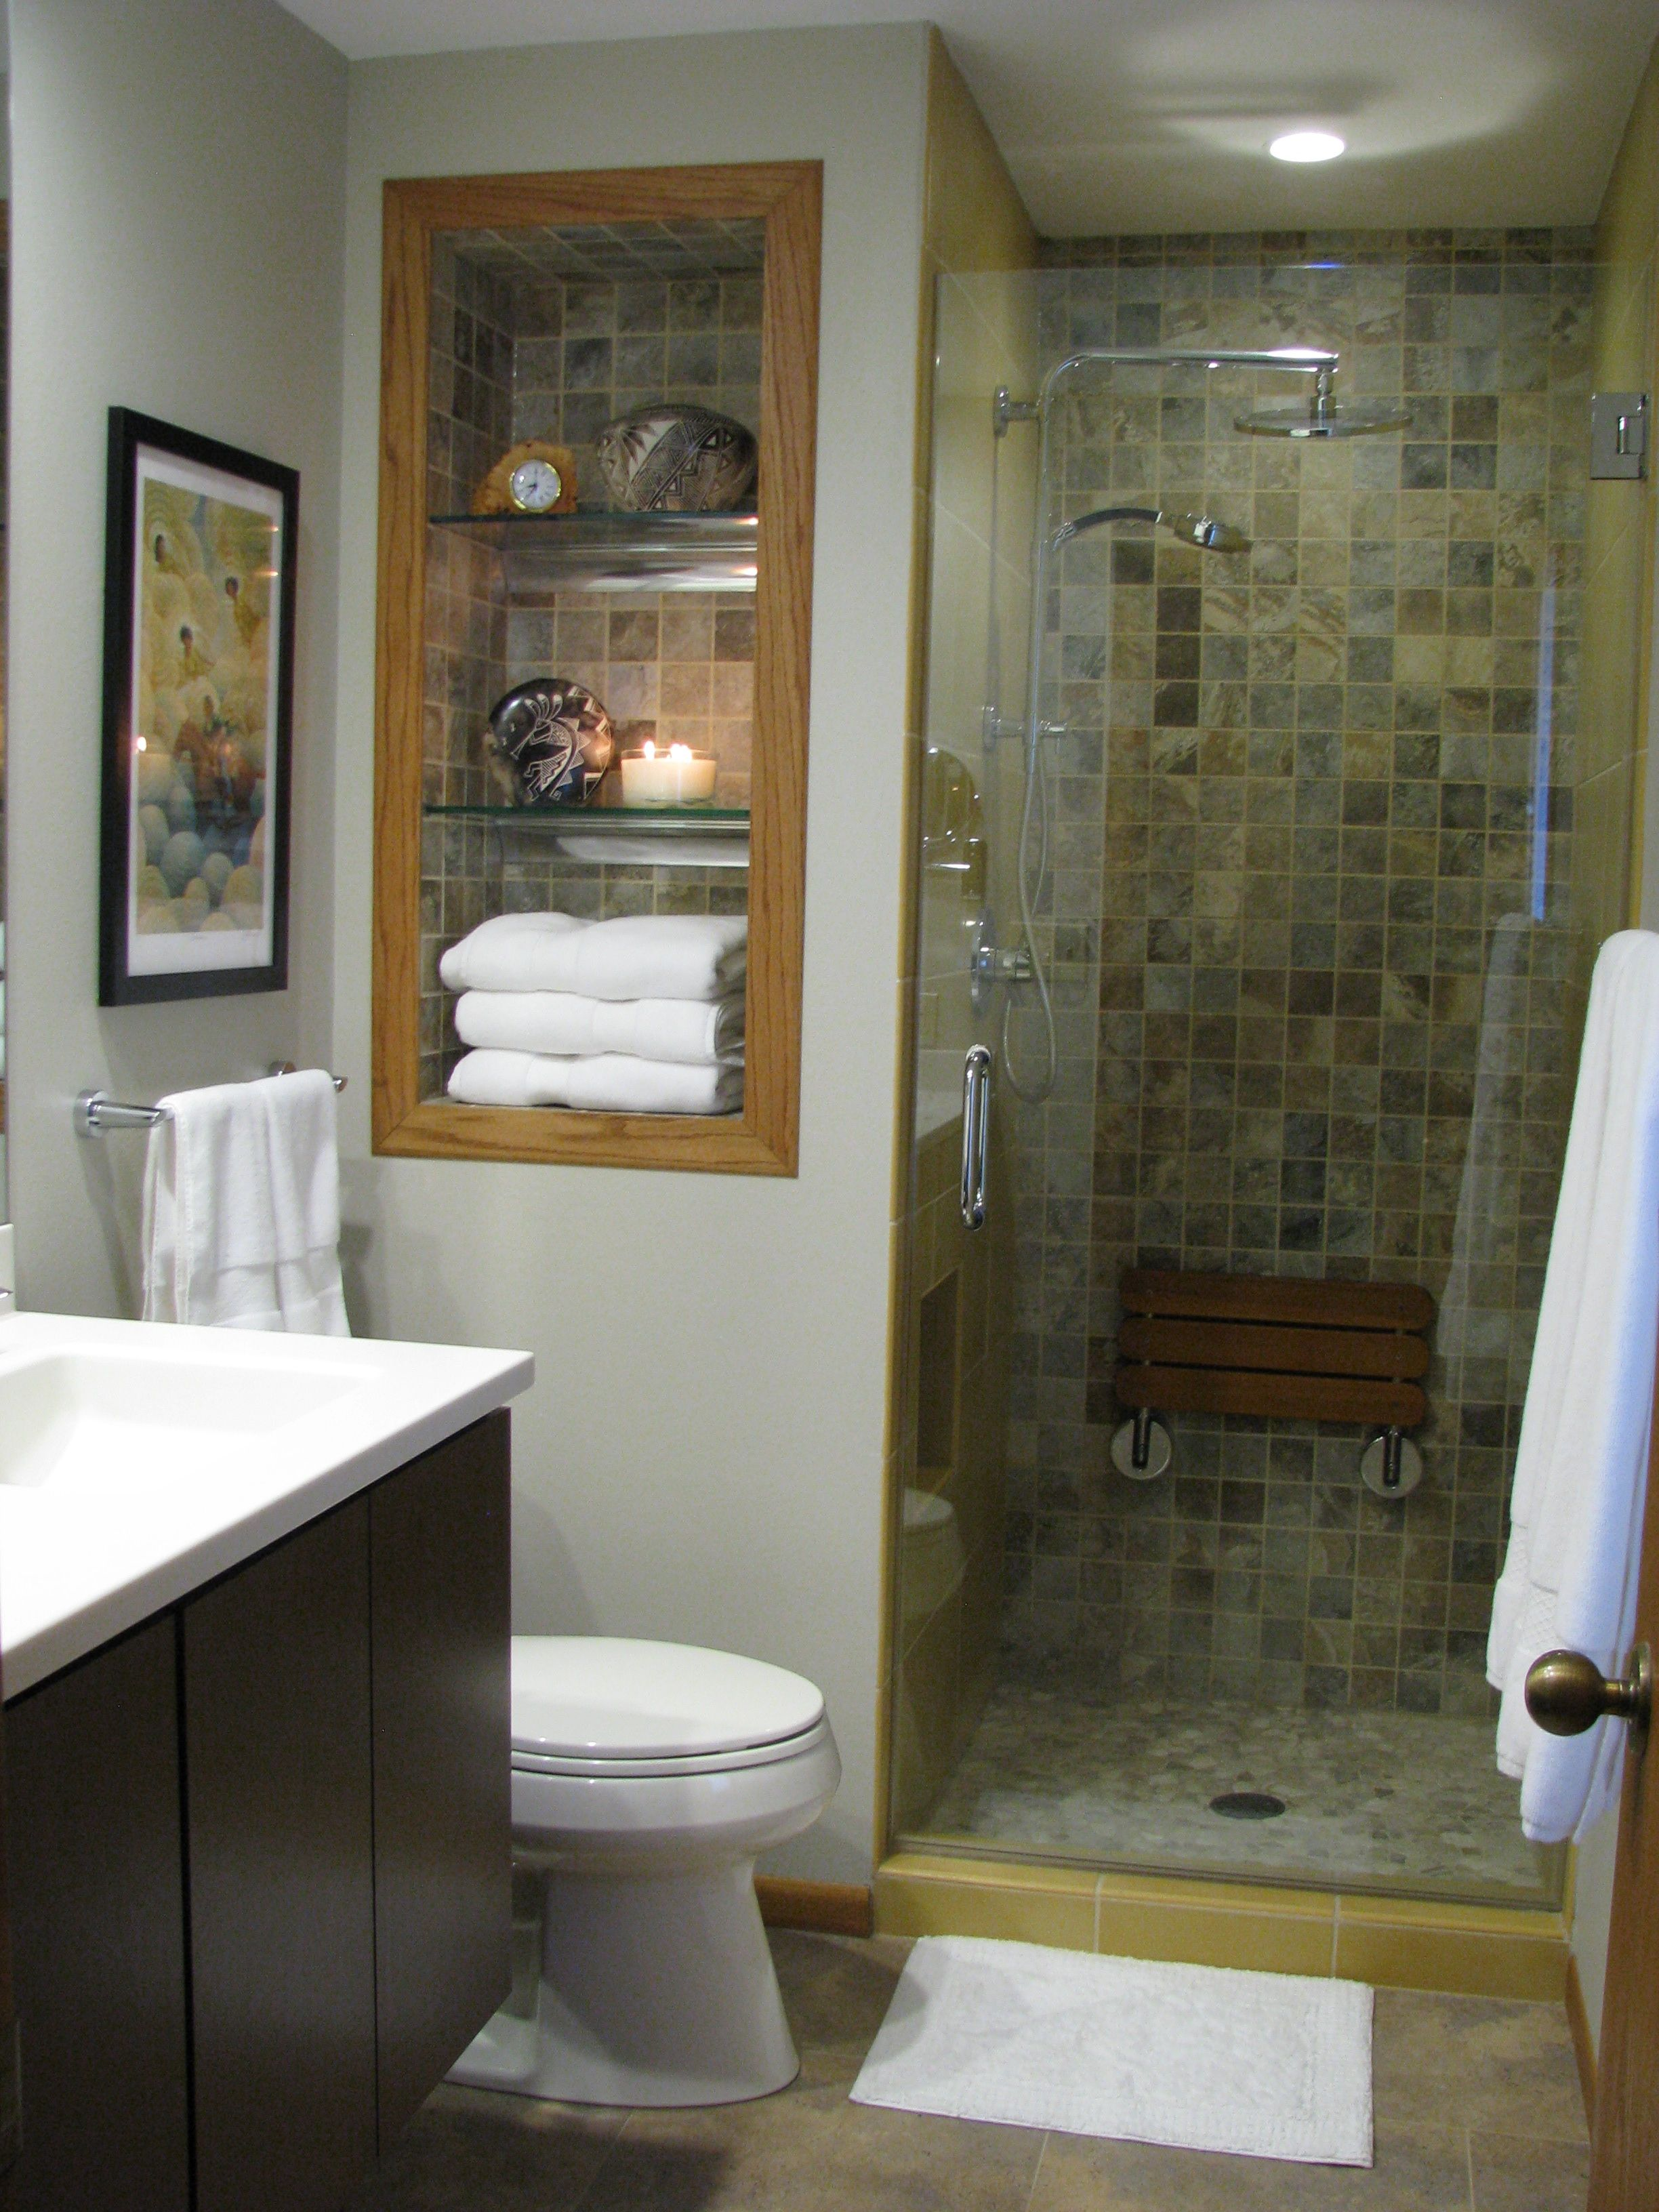 small bathroom remodel ideas pinterest | Small bathroom ...